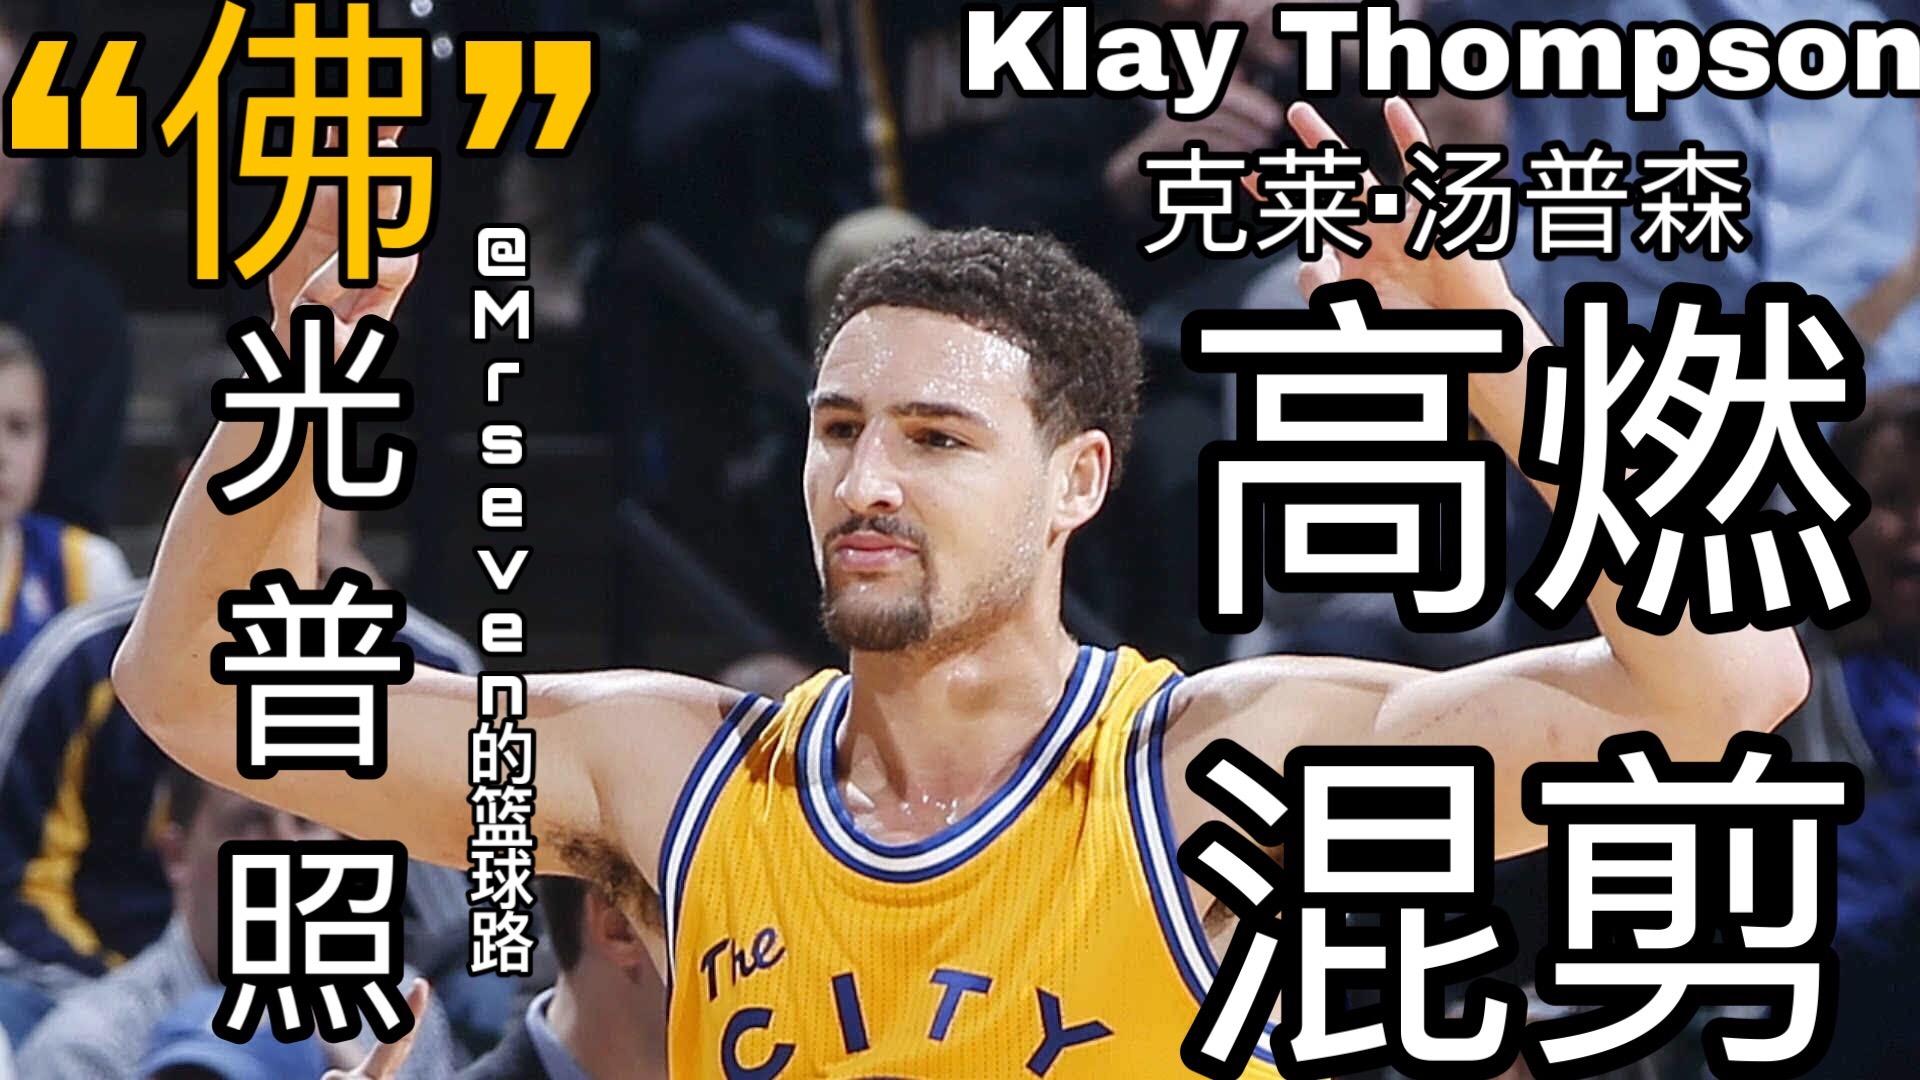 "【Klay Thompson】克莱汤普森高燃混剪!顶级的三分射手""佛""光普照!"